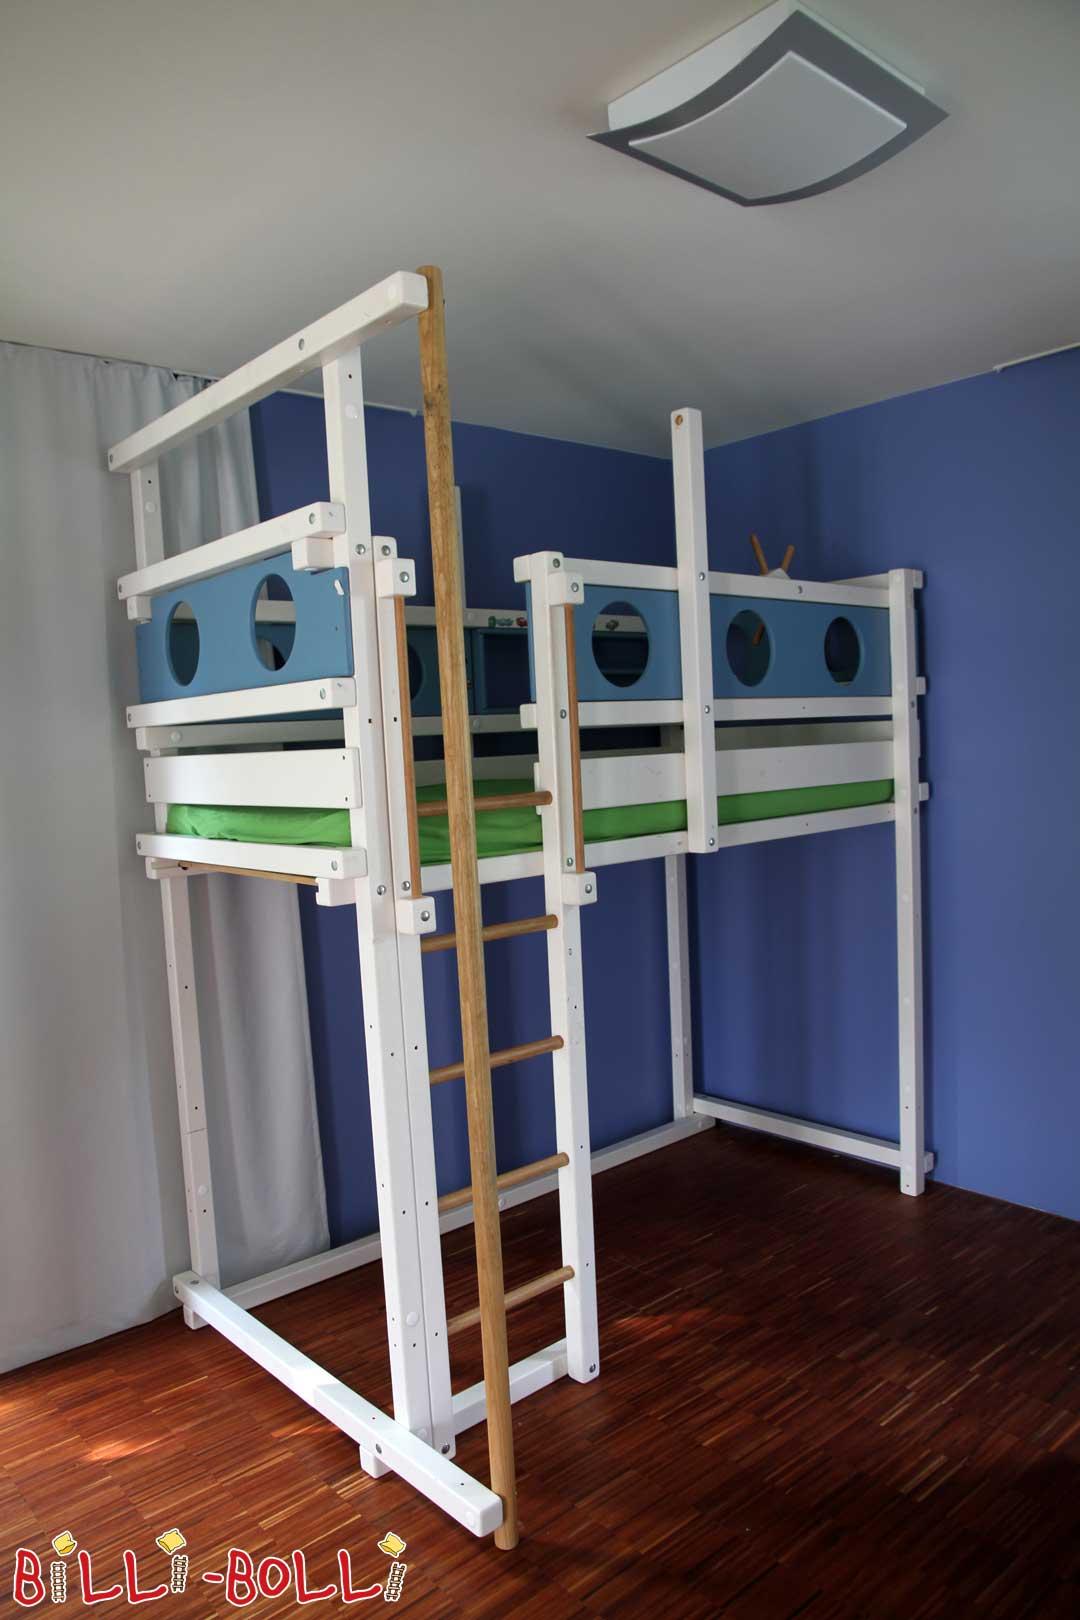 Full Size of Sprossenwand Kinderzimmer Klettern Am Hochbett Oder Etagenbett Billi Bolli Regal Weiß Sofa Regale Kinderzimmer Sprossenwand Kinderzimmer